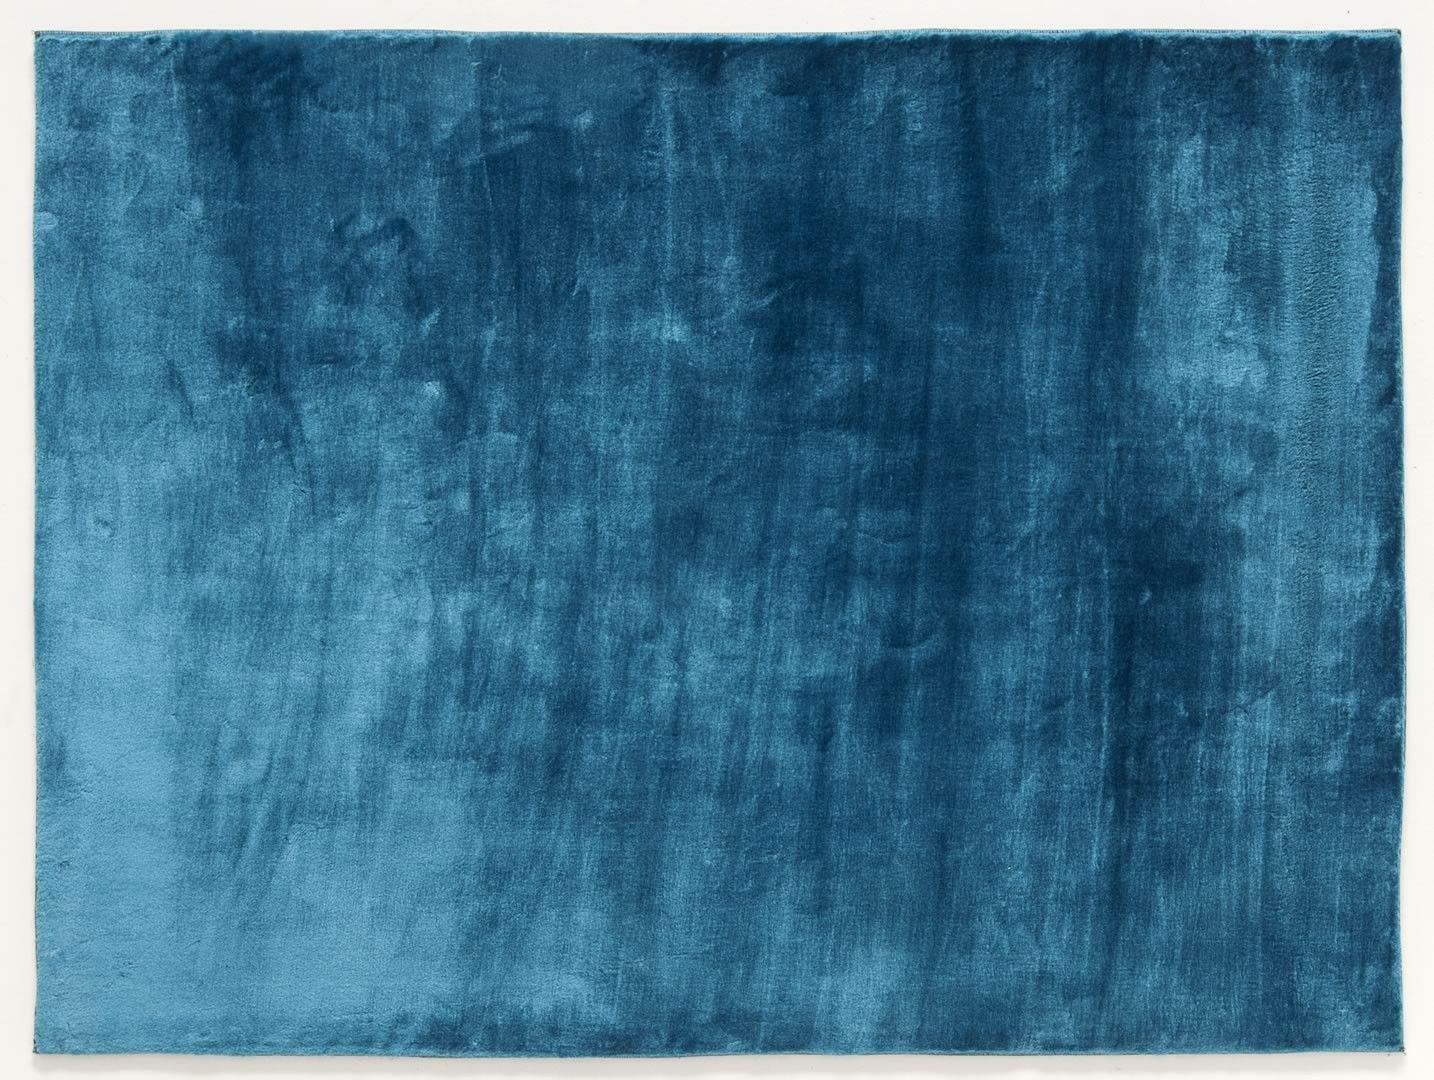 tapis relief shaggy bleu aspen en 2019 d co int rieur bleu tapis bleu tapis bleu canard. Black Bedroom Furniture Sets. Home Design Ideas